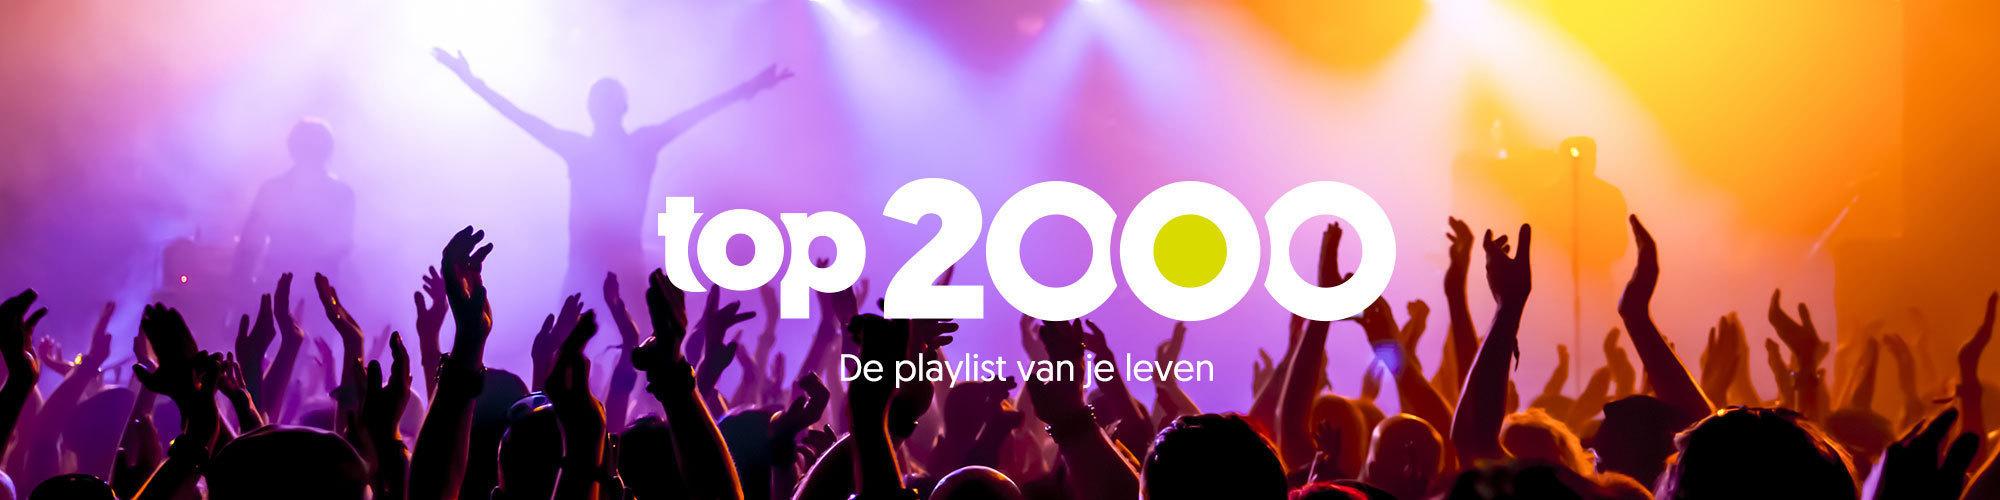 Joe carrousel top2000 finaal playlistvanjeleven 4